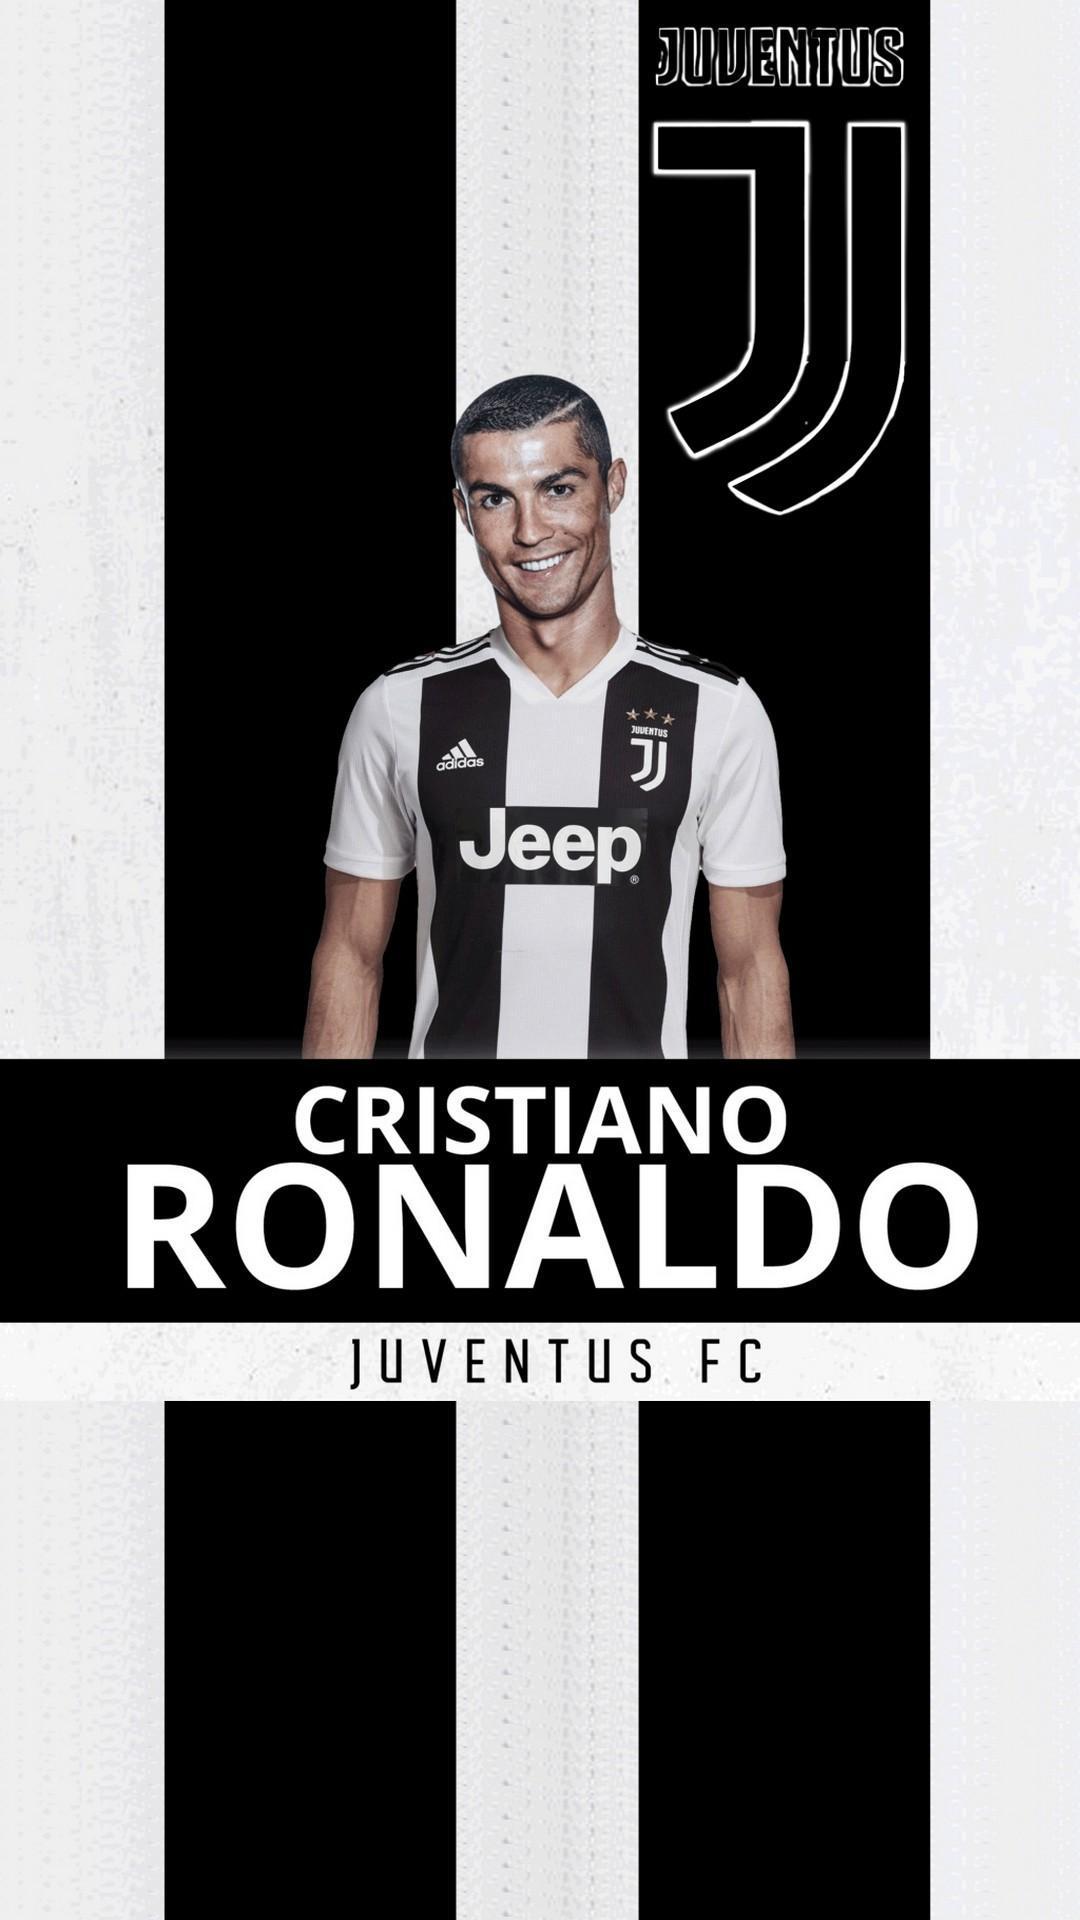 cristiano ronaldo juventus wallpapers hd for android apk download cristiano ronaldo juventus wallpapers